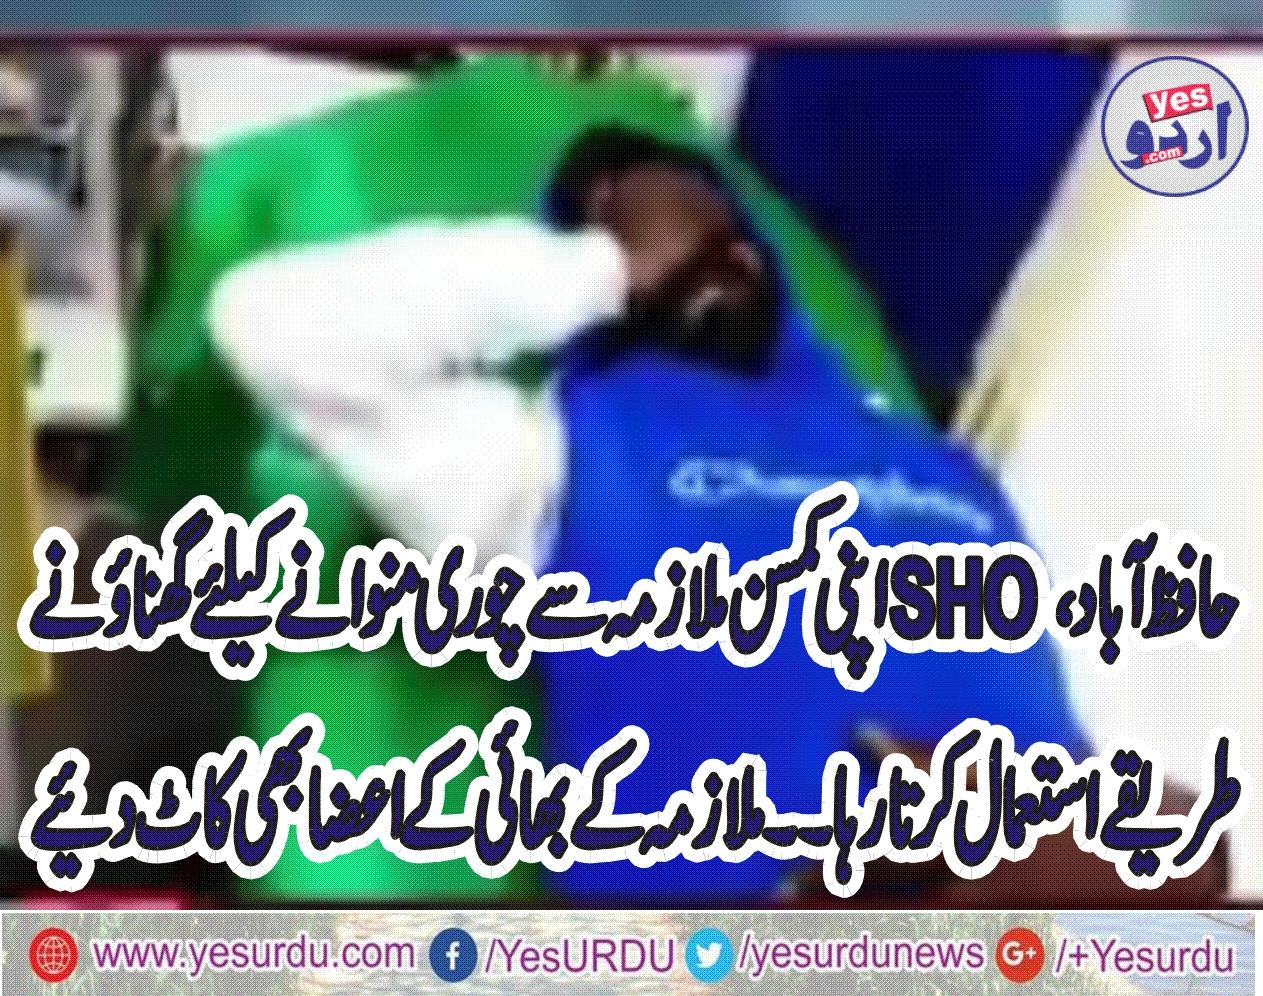 very, sad, incident, in, hafizabad, punjab, SHO, tortured, badly, his, child, servant